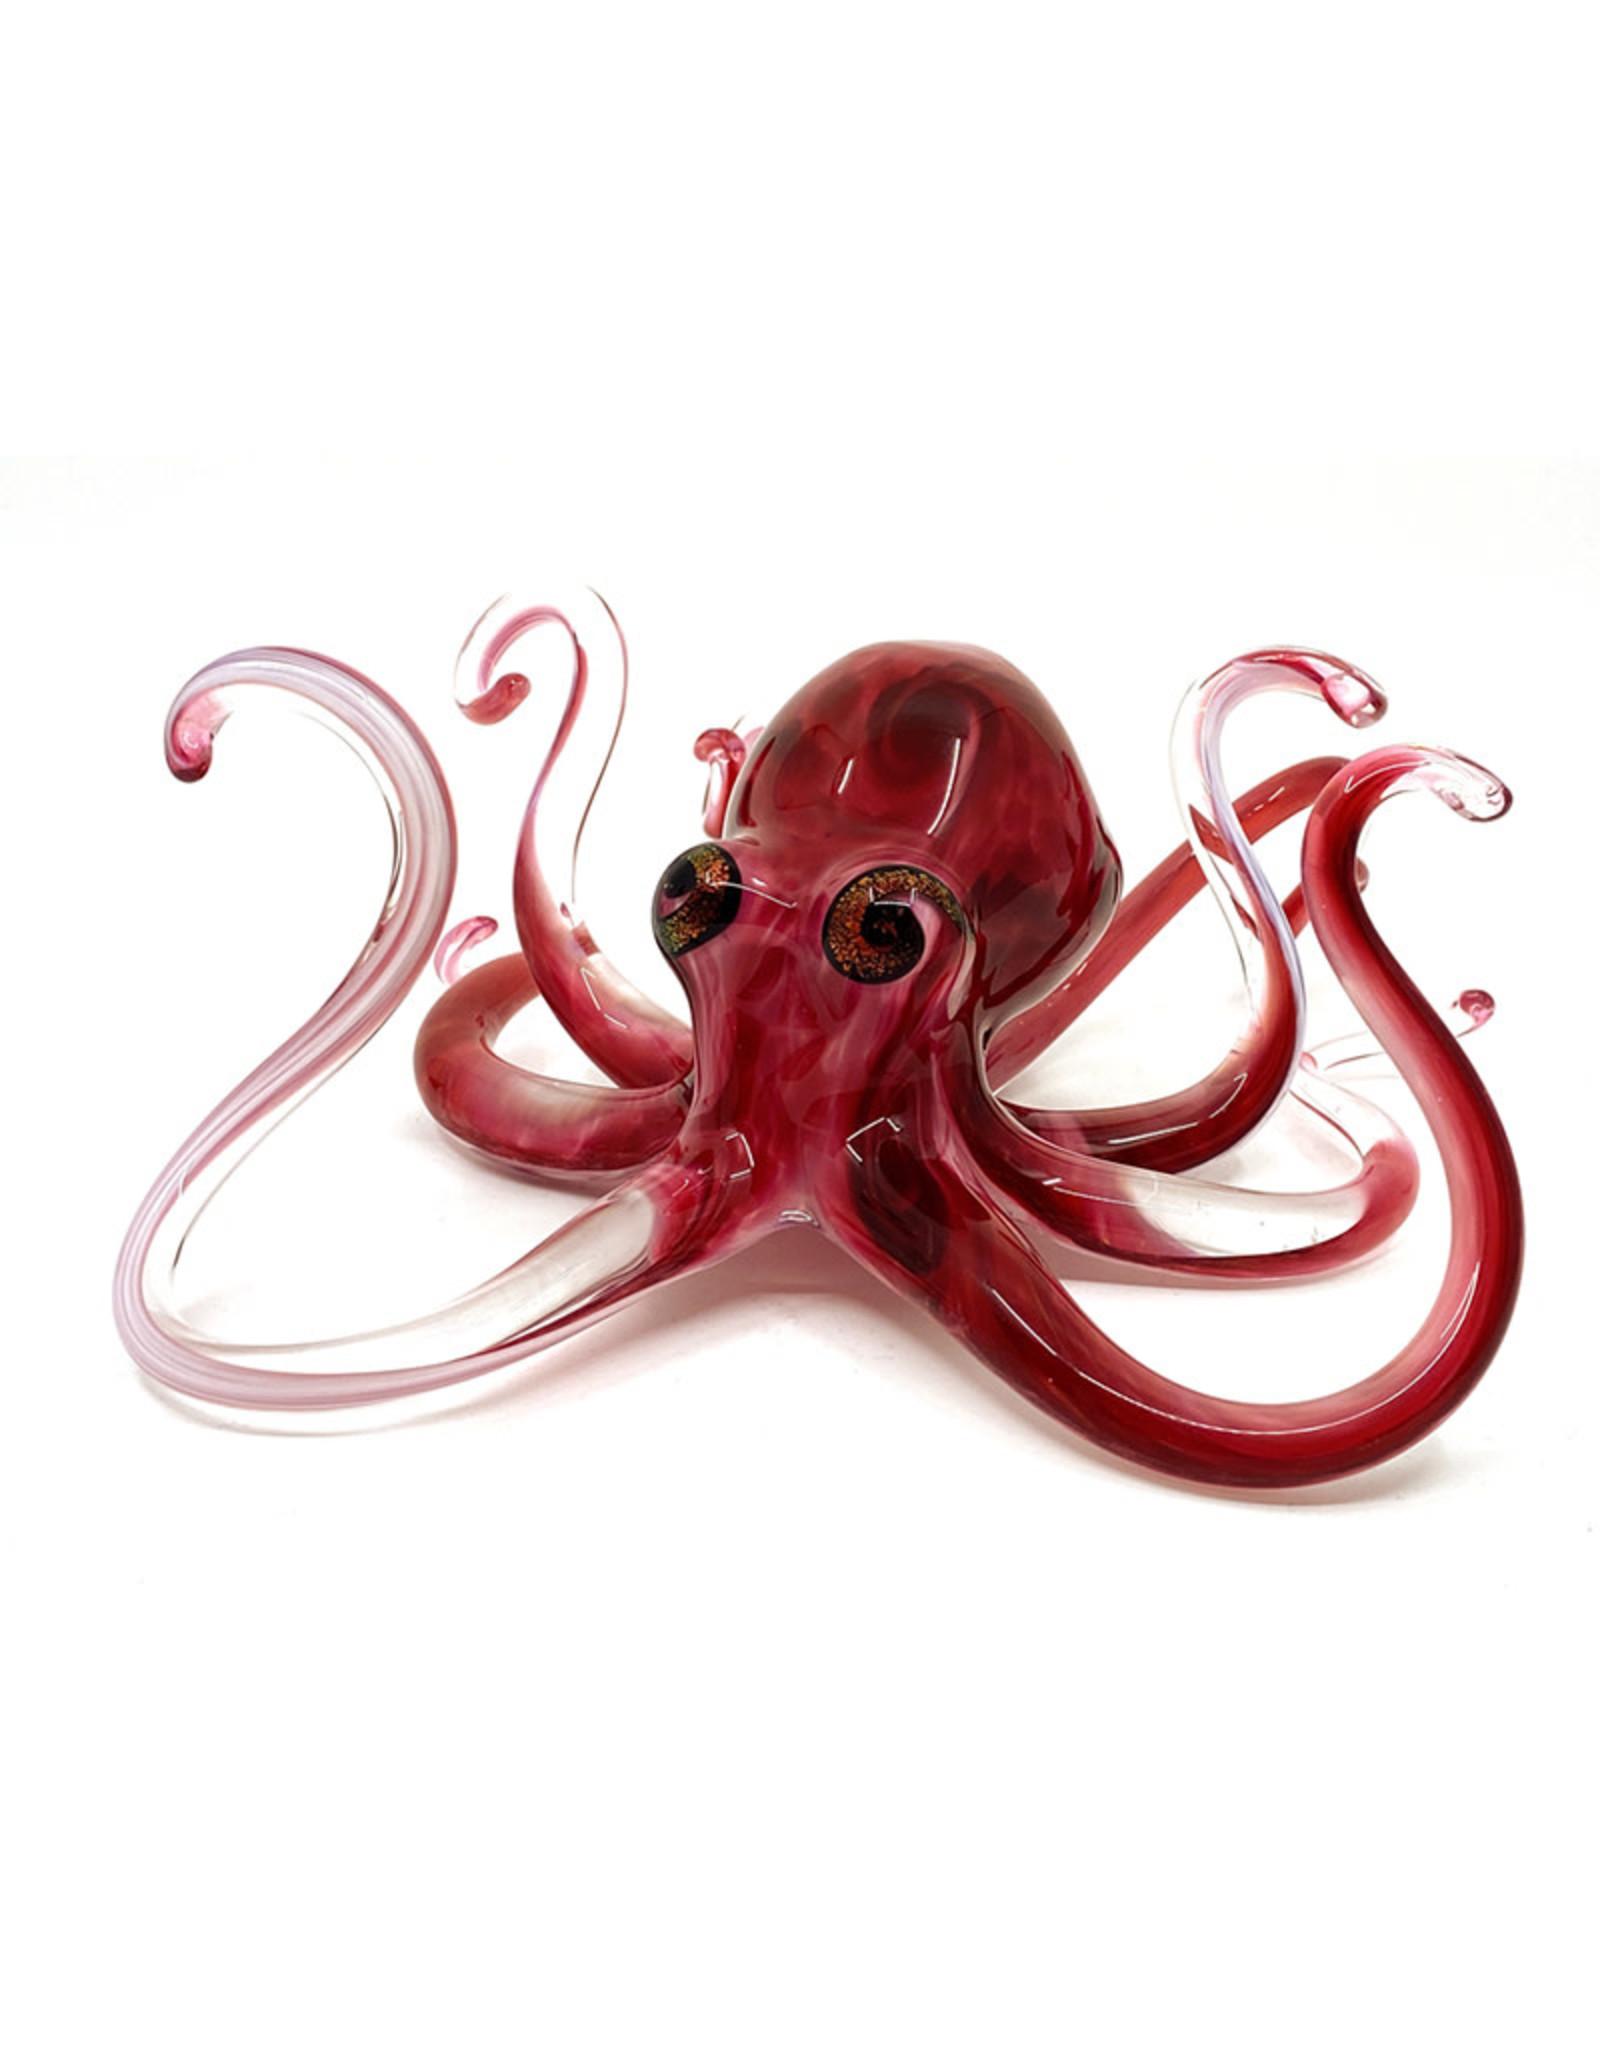 MICHAEL HOPKO SMALL RED OCTOPUS